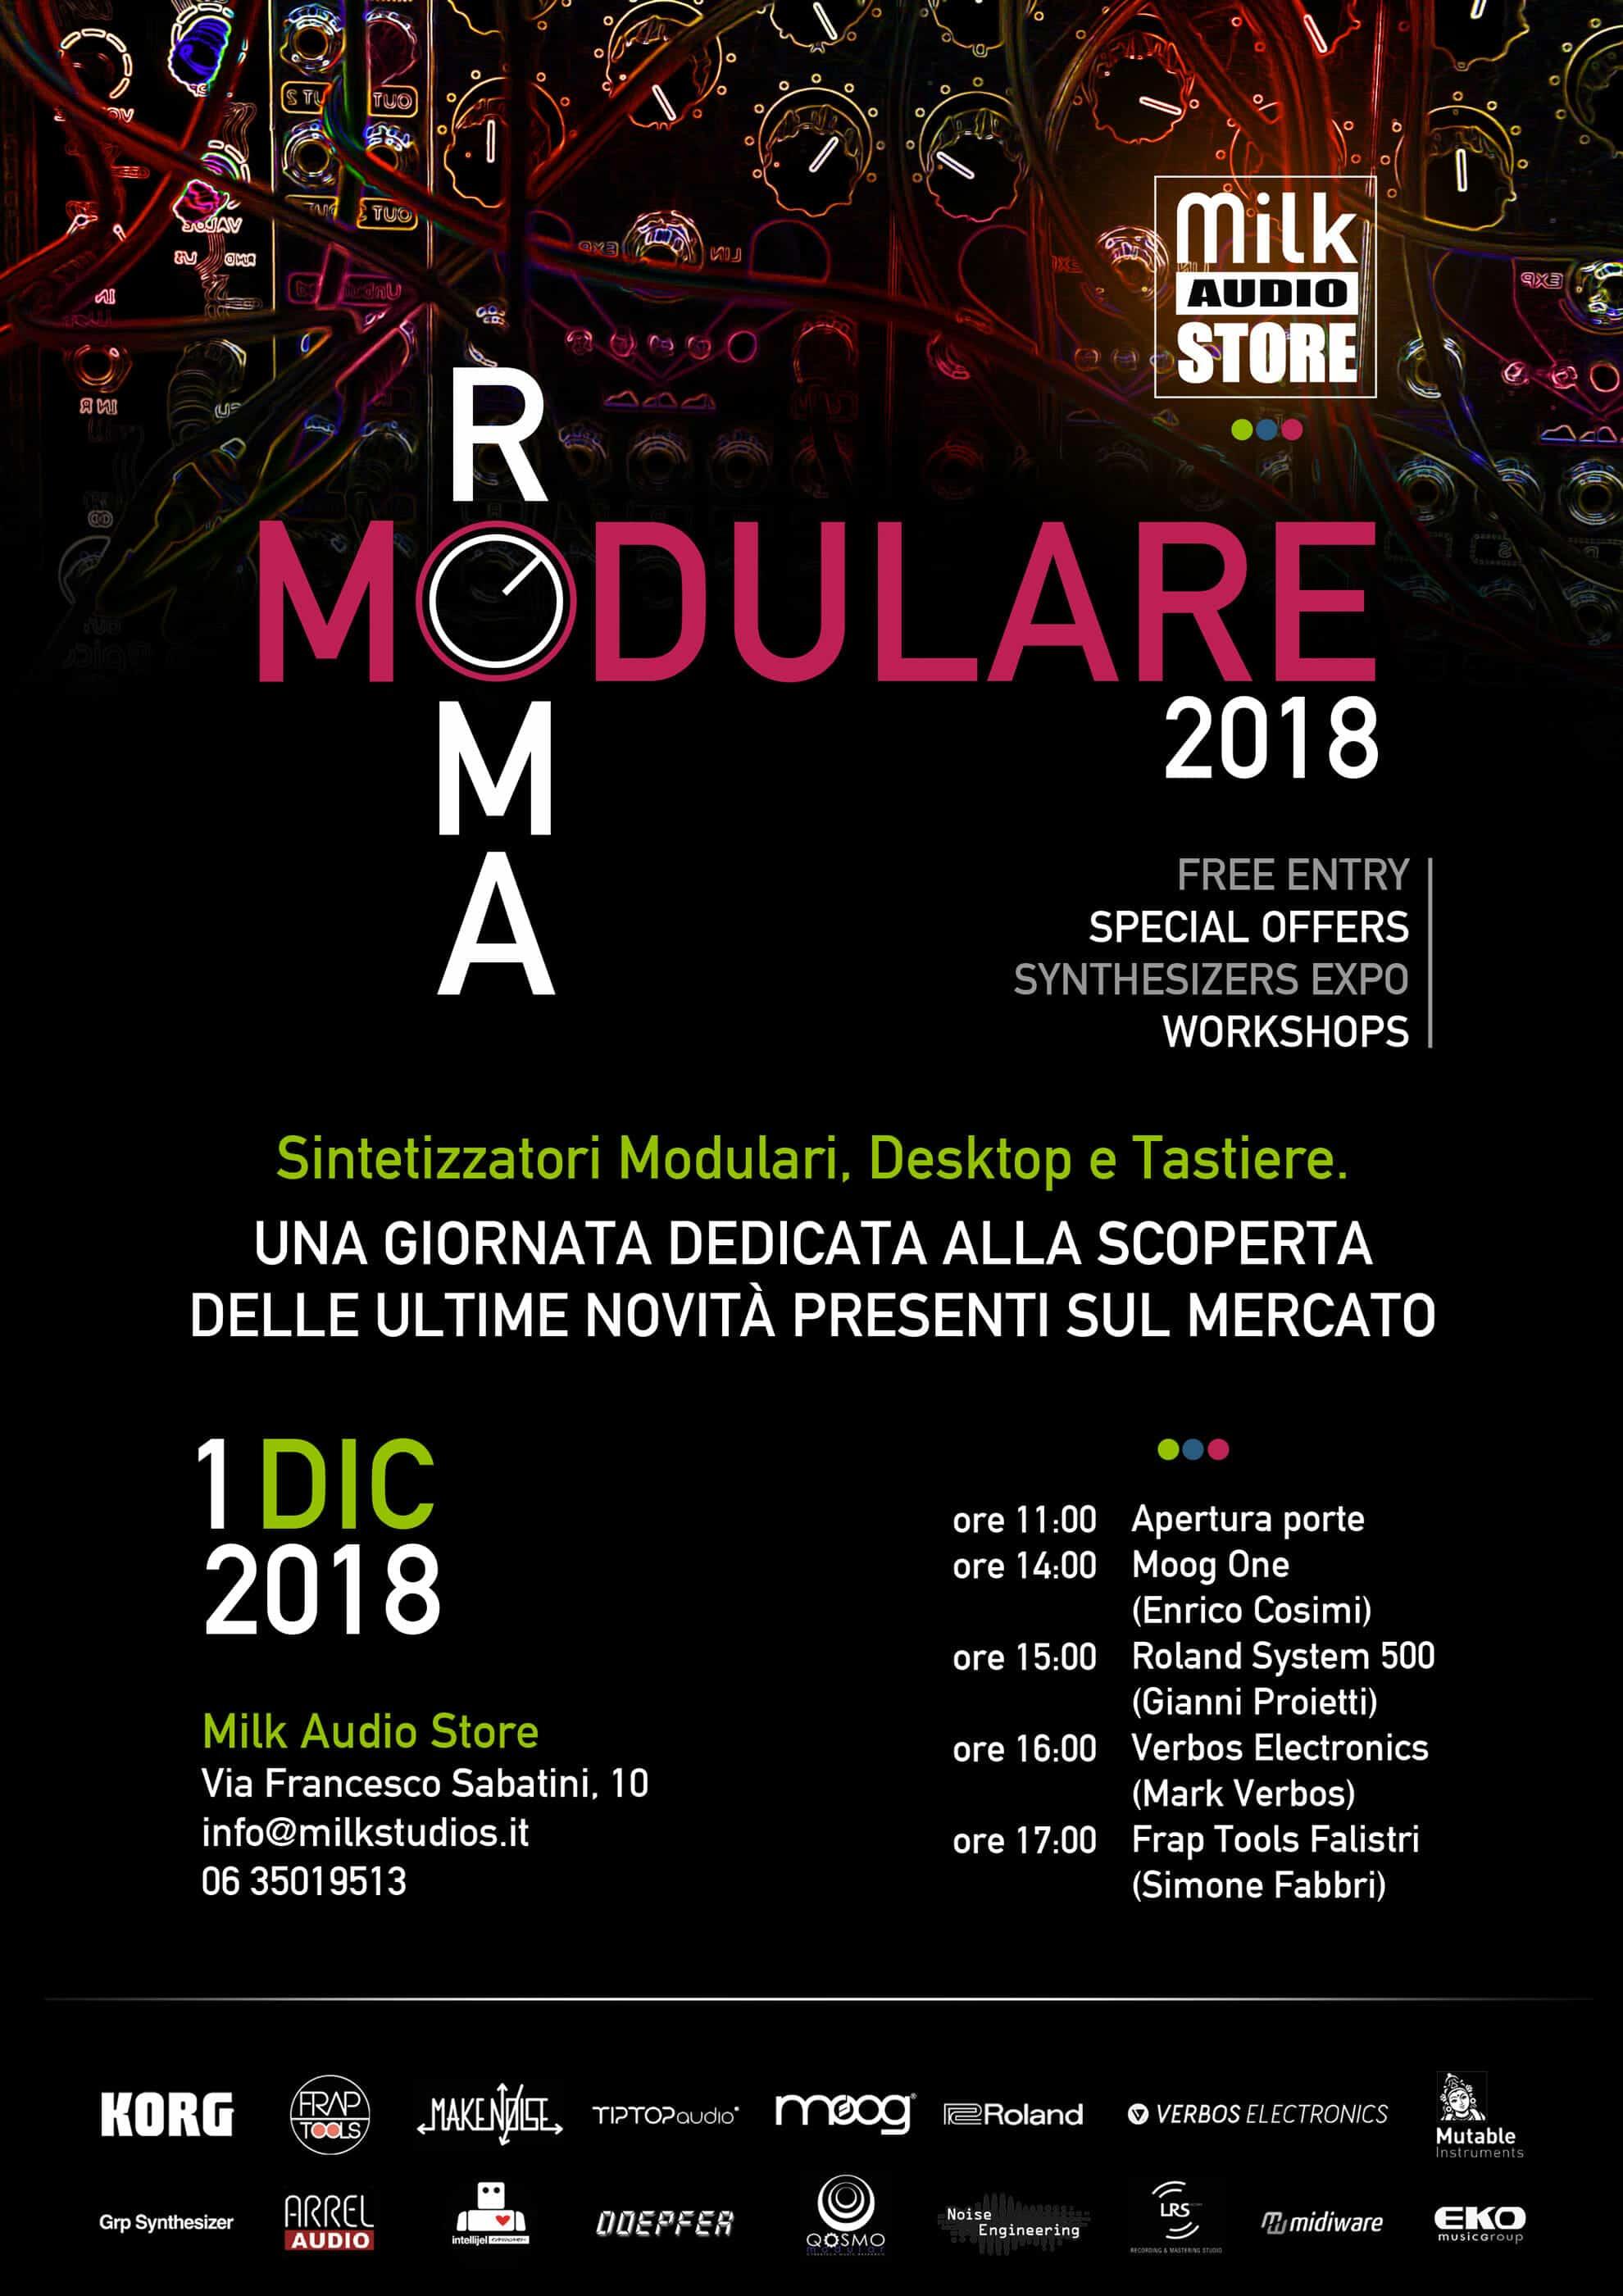 RomaModulare - volantino - programma Workshop Synth Modulari